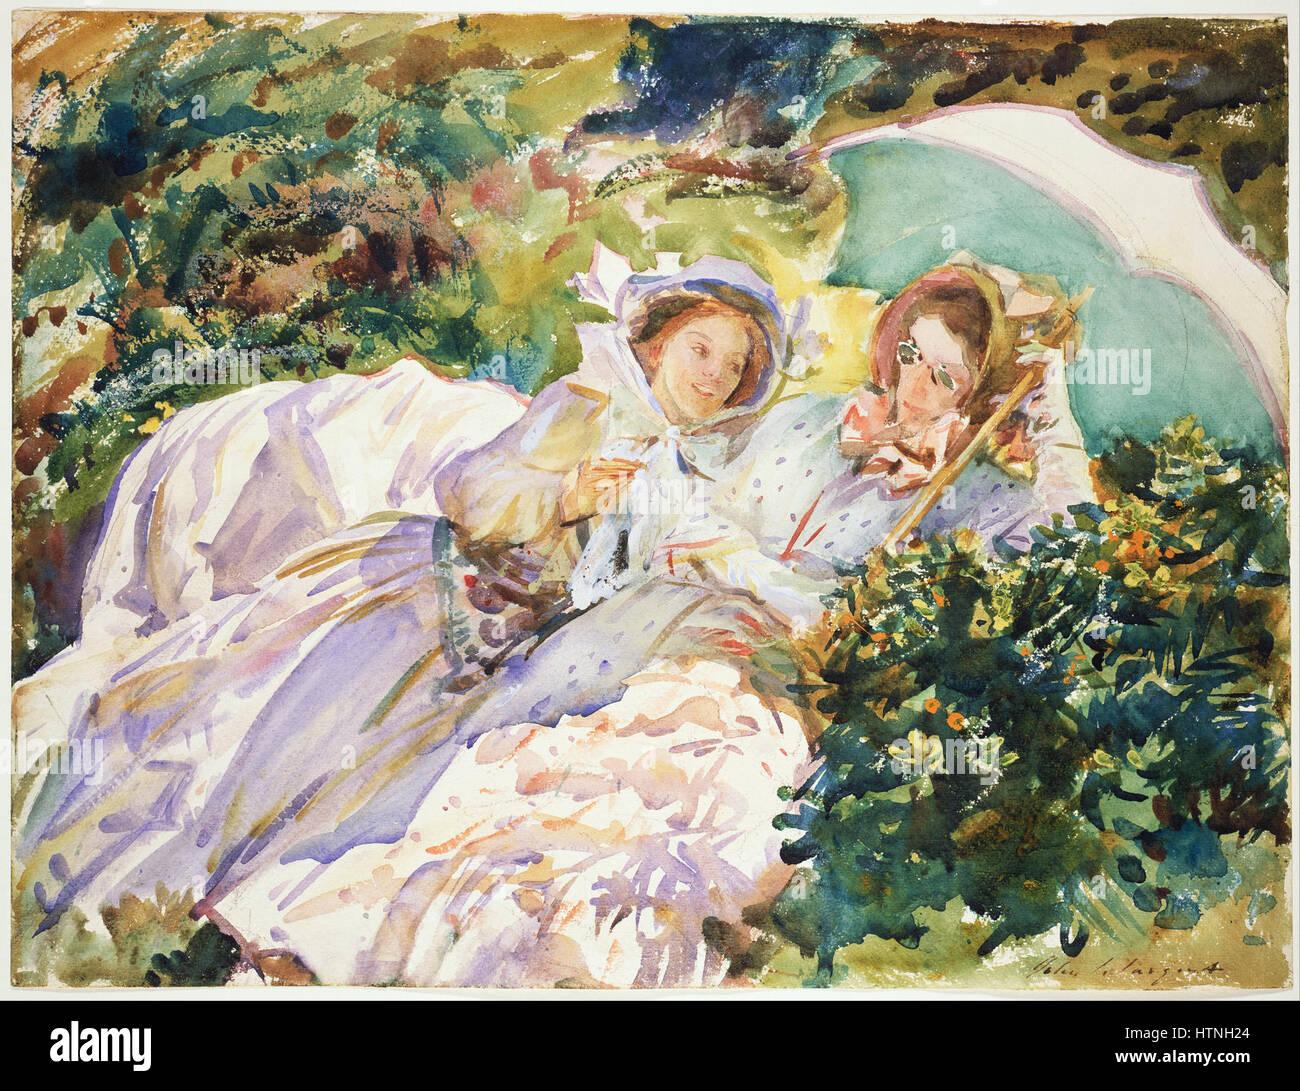 John Singer Sargent - Simplon Pass- The Tease - Google Art Project Stock Photo